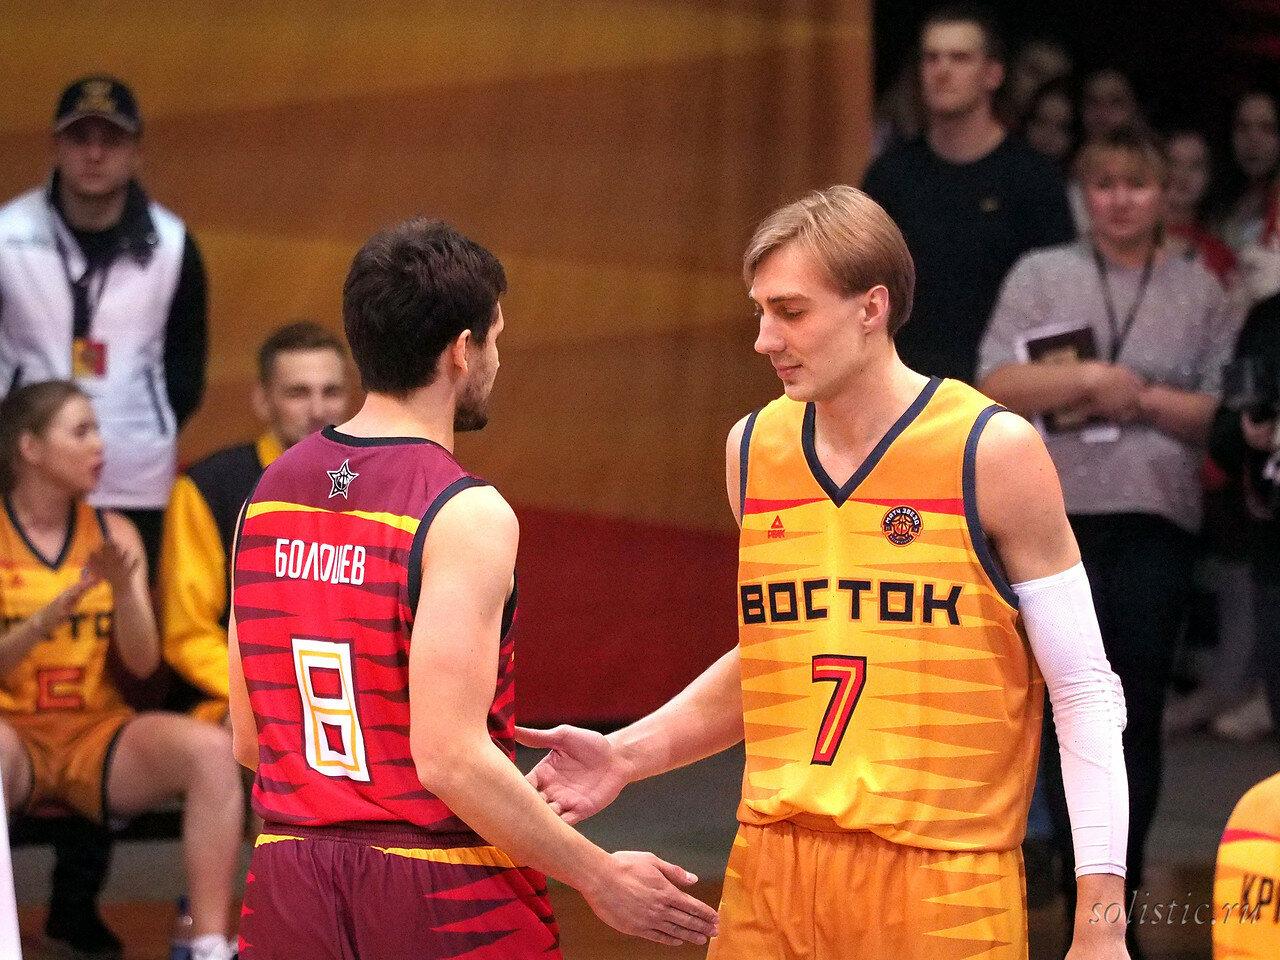 107 Матч звезд АСБ 2018 (ассоциации студенческого баскетбола)